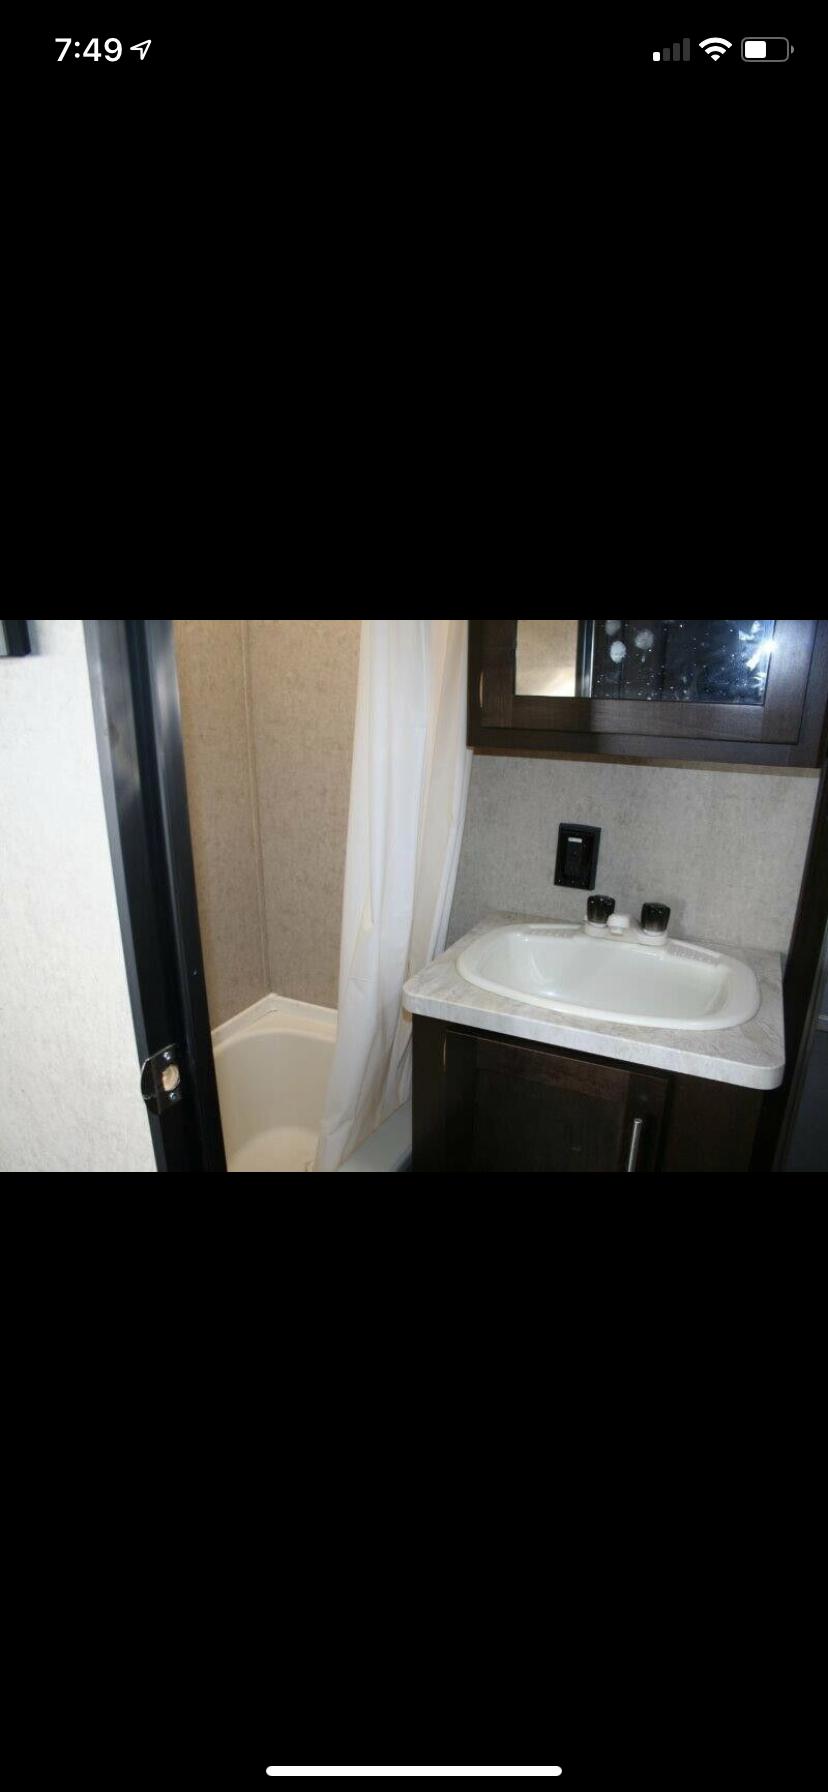 Bathroom . cherokee 27DBH 2015